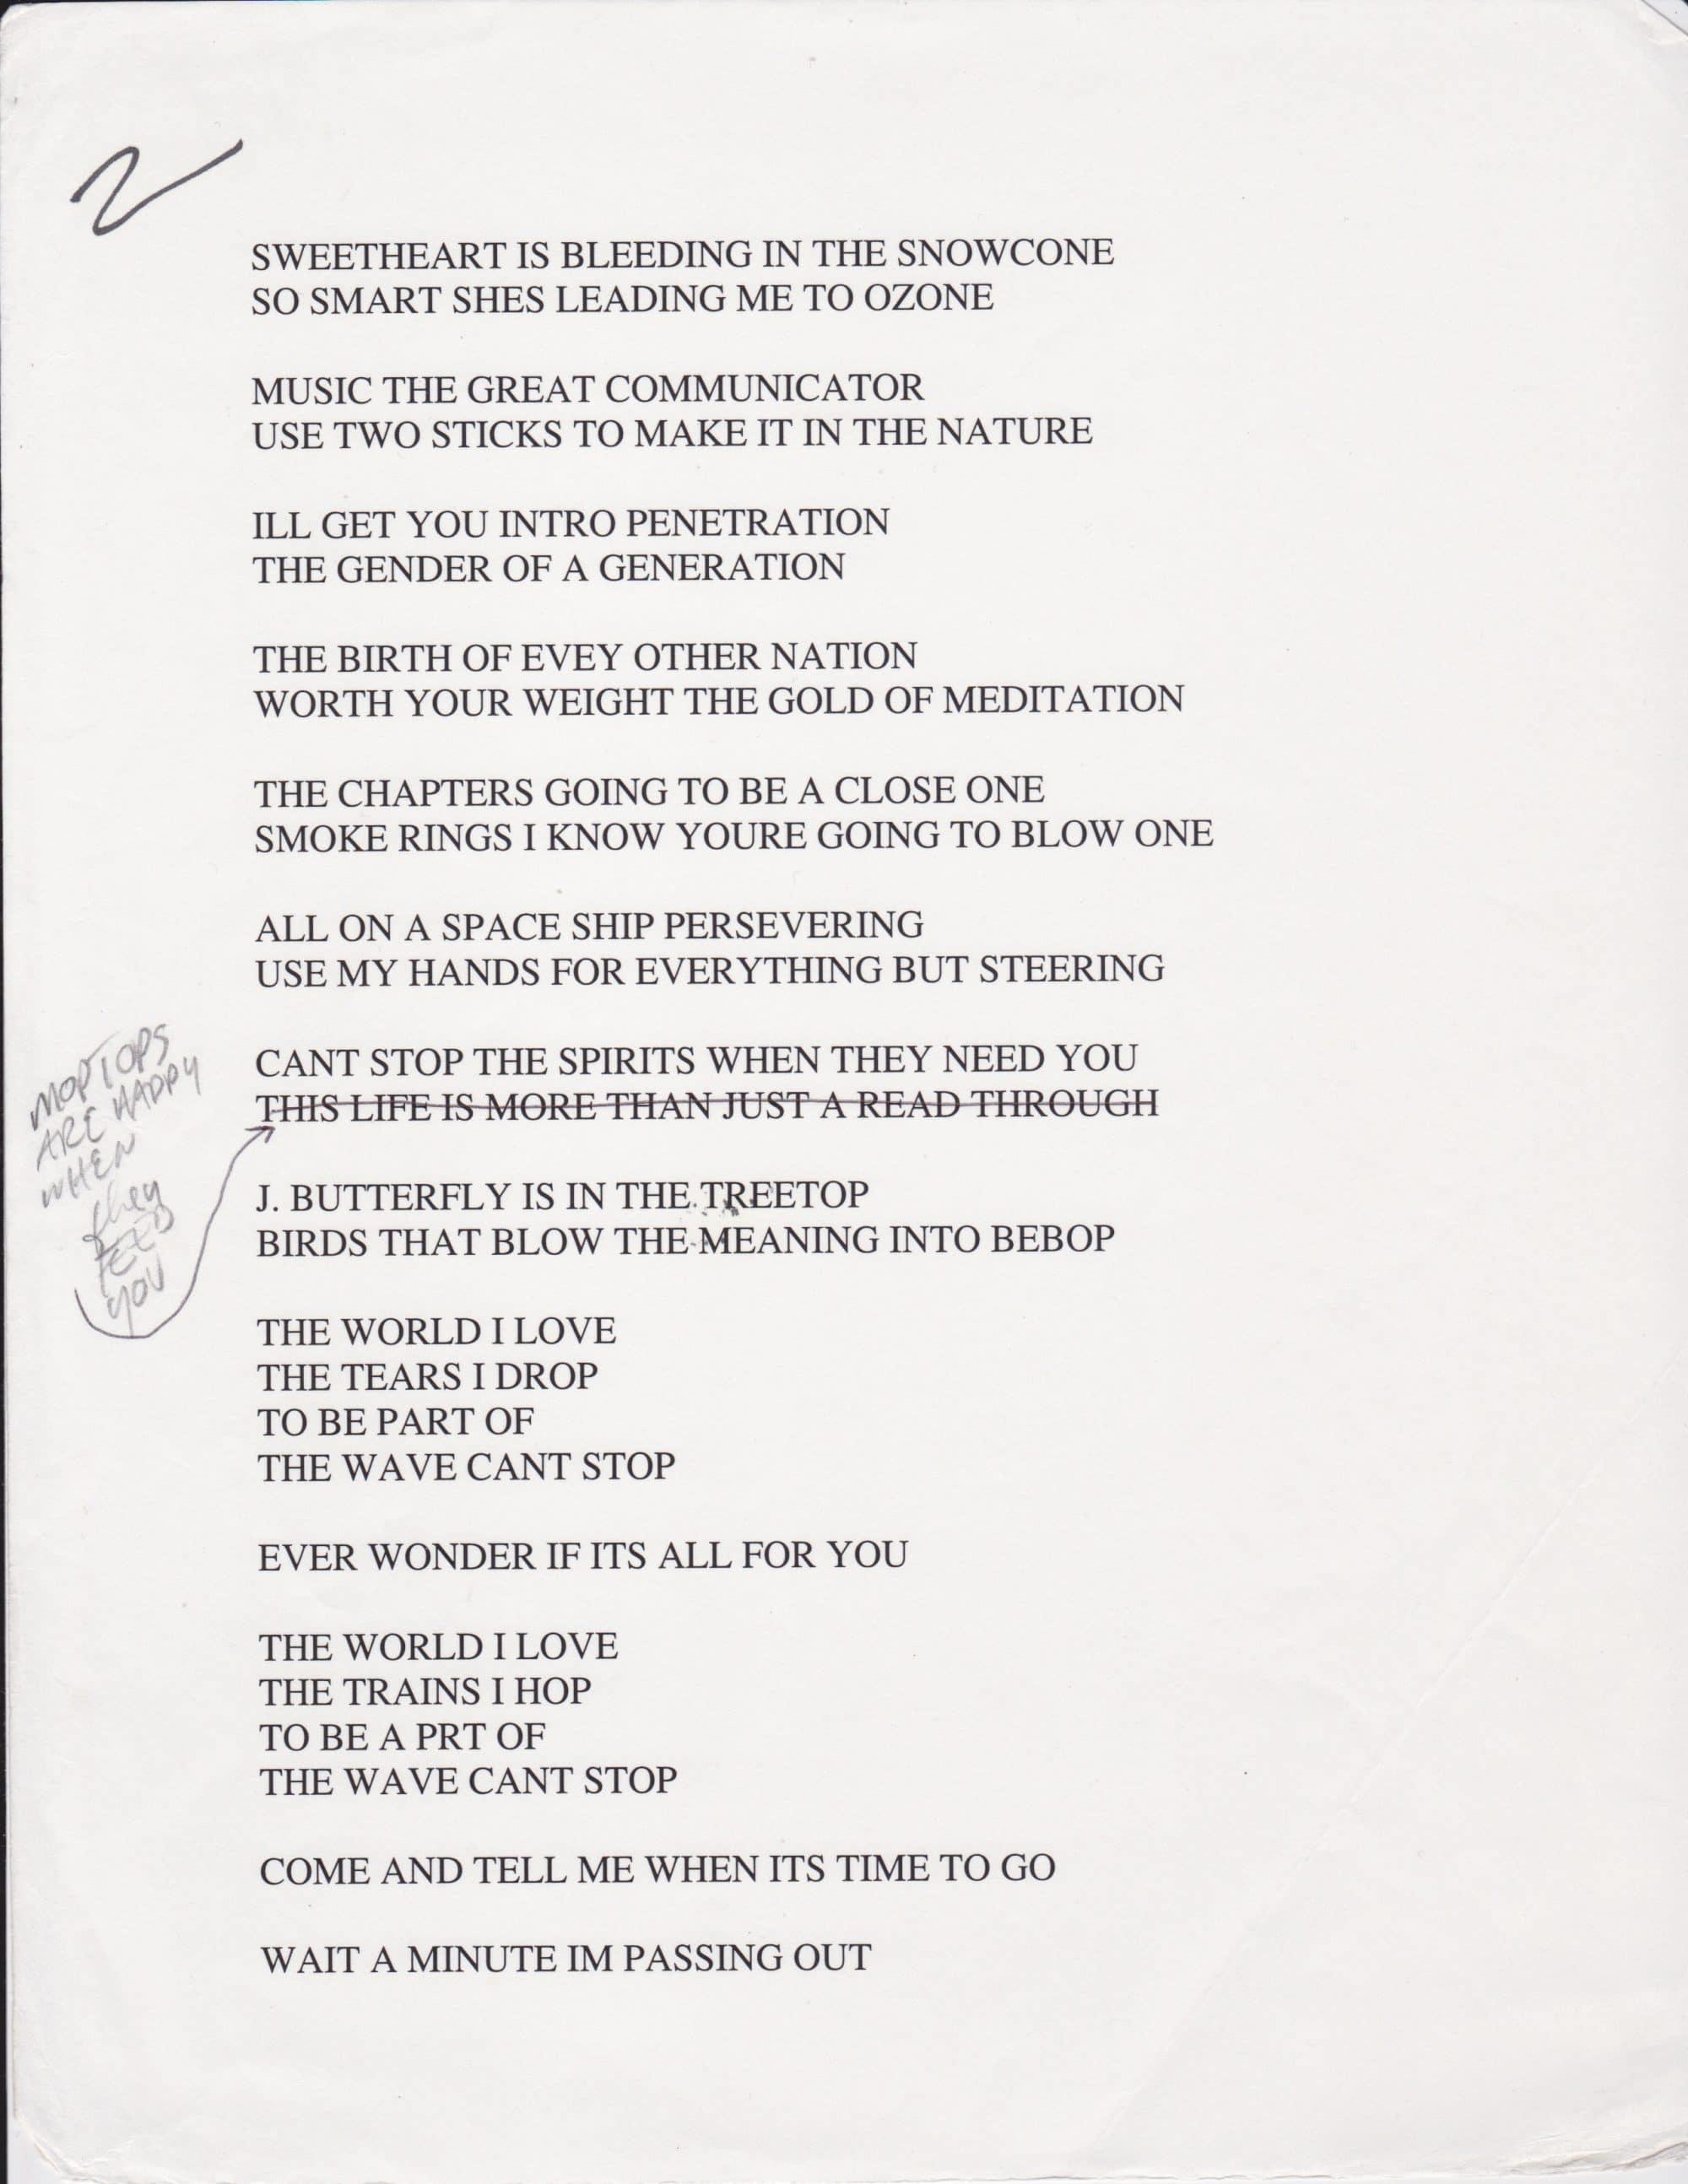 Record collection lyrics